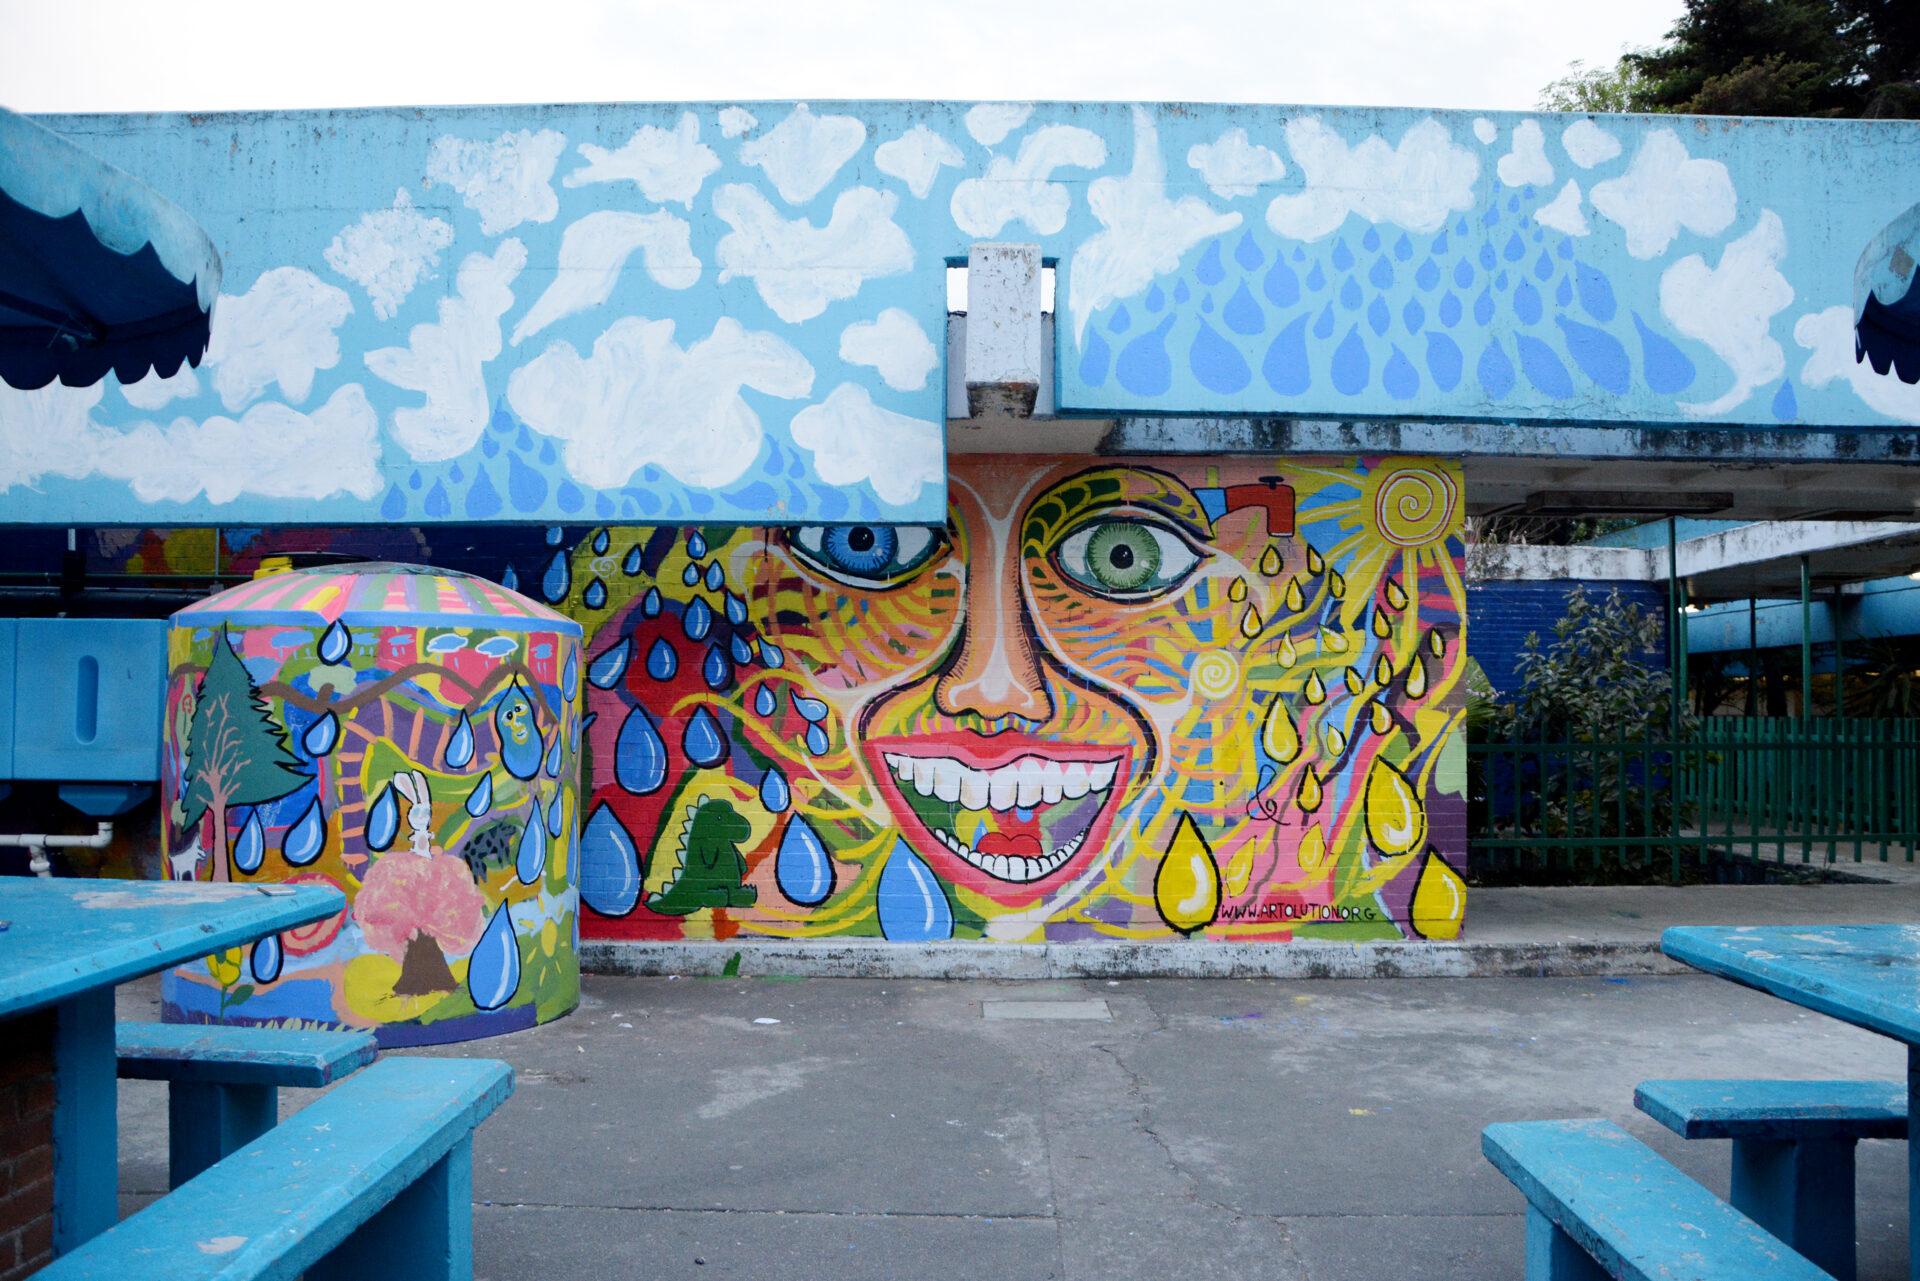 Water Culture Program_School system in Mexico City_Community Mural by Artolution Max Frieder_ Credit Isla Urbana